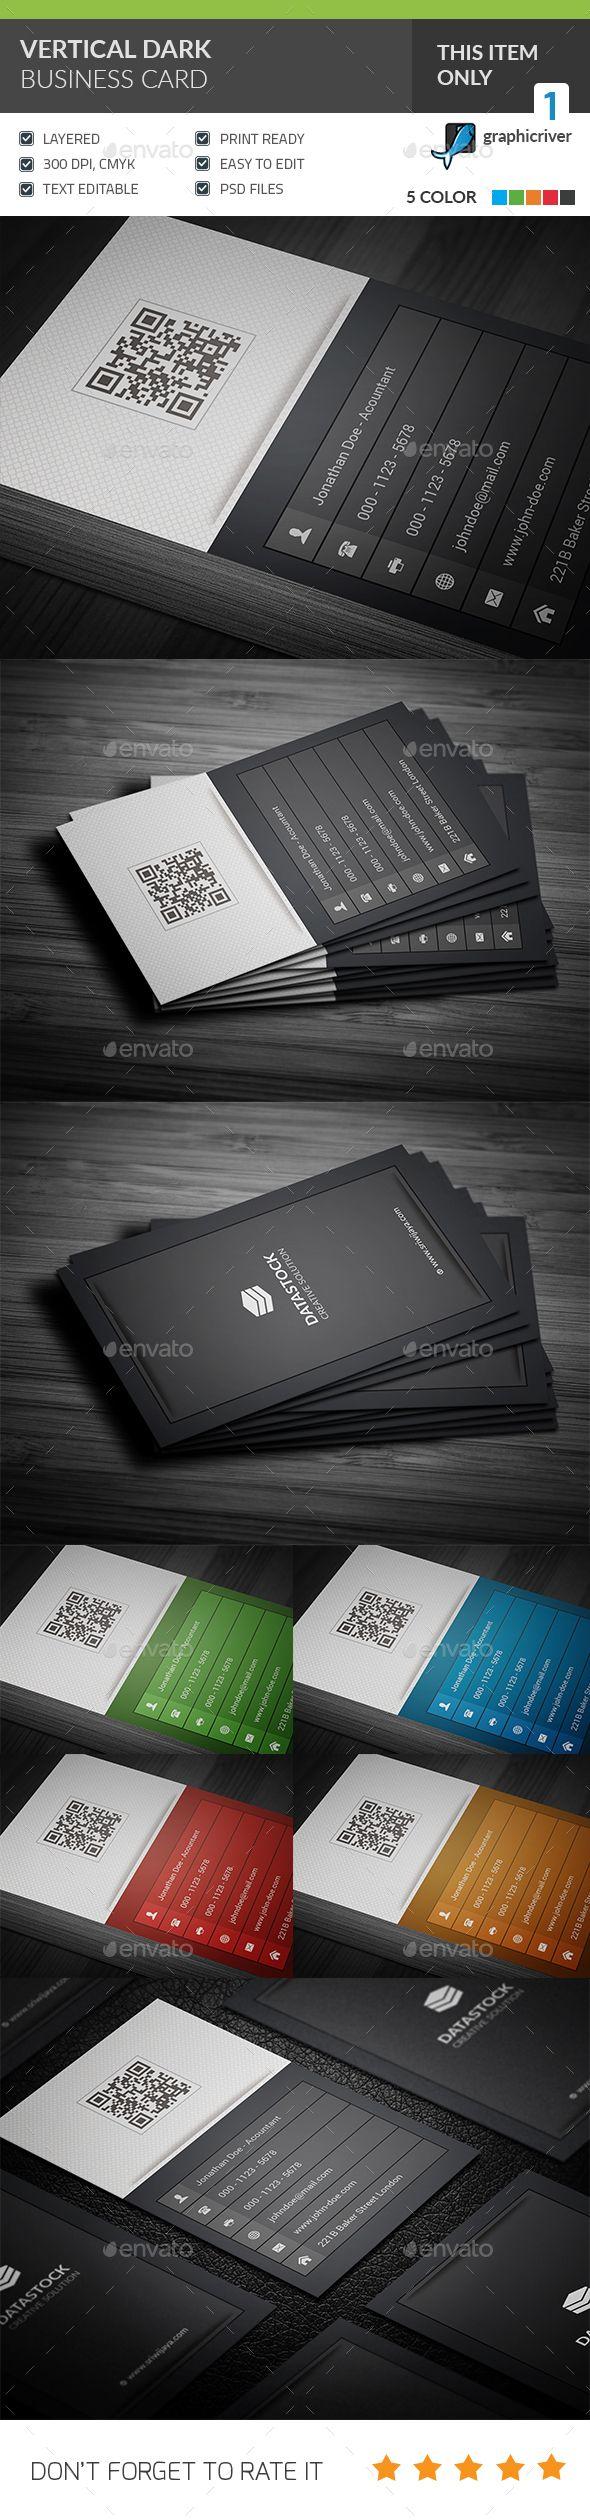 Vertical Dark Corporate Business Card Template PSD